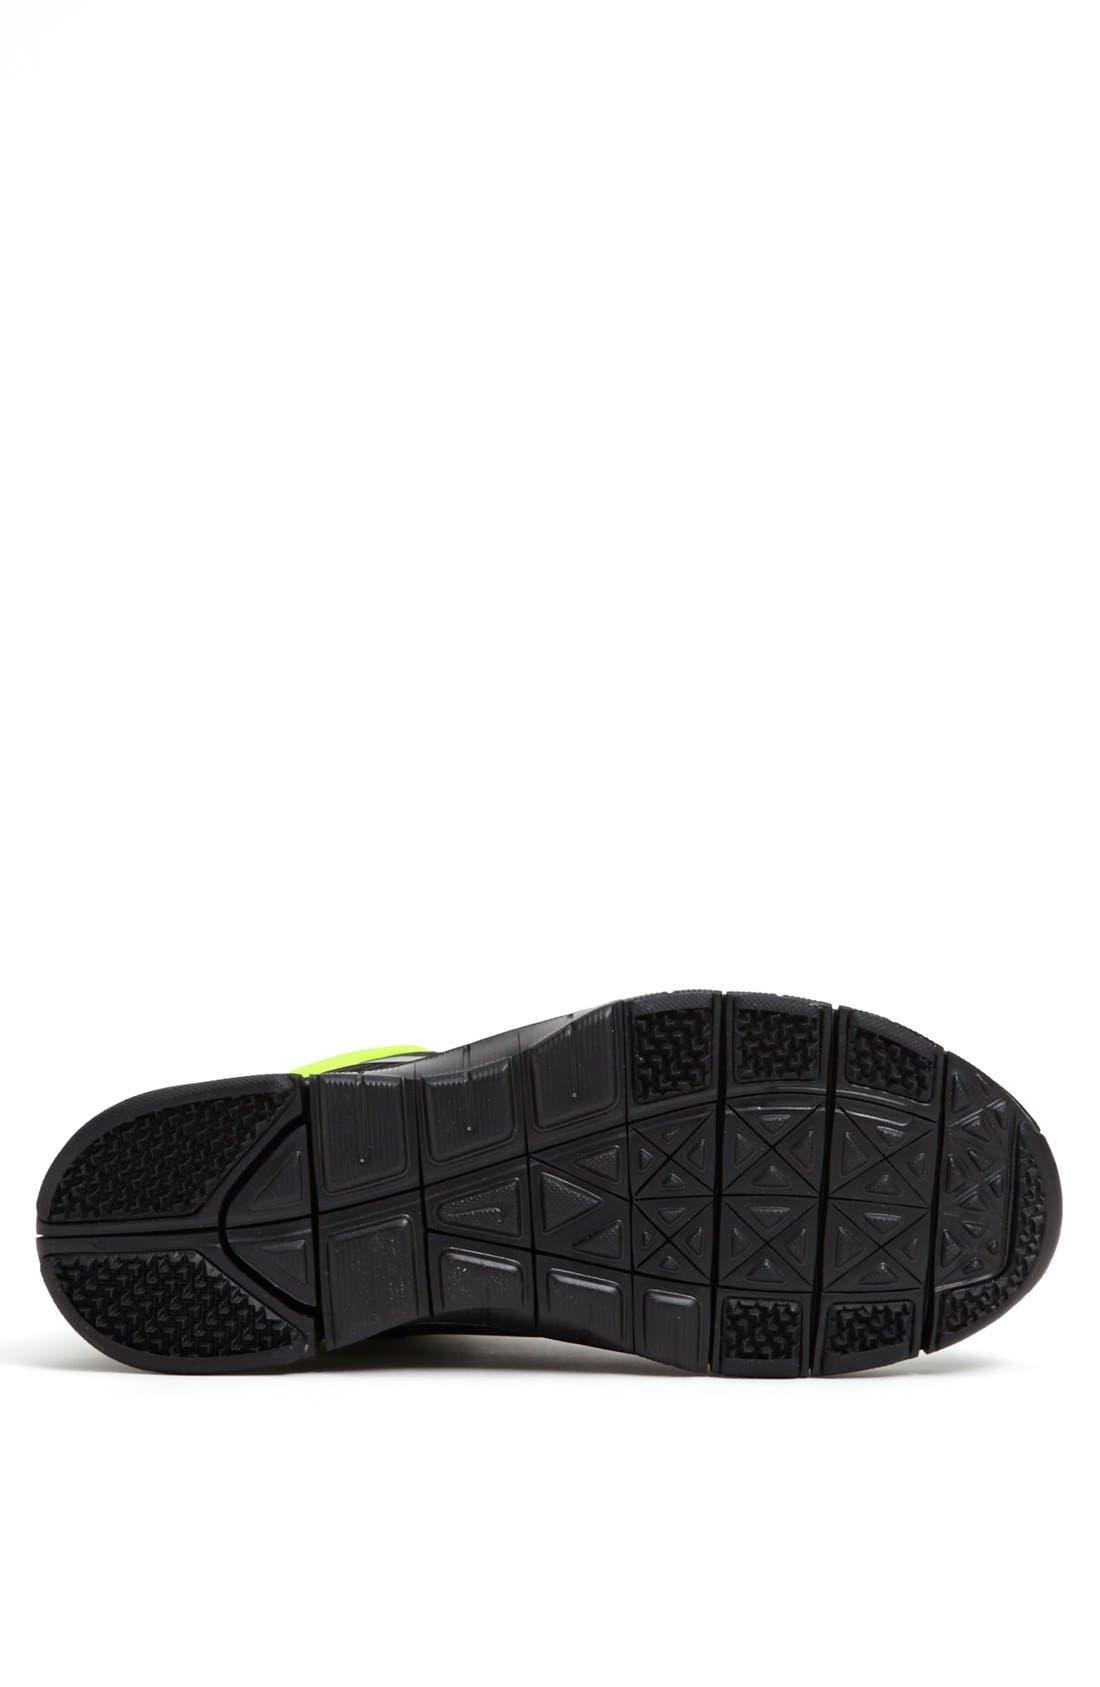 Alternate Image 4  - Nike 'Free Trainer 3.0 Mid' Training Shoe (Men)